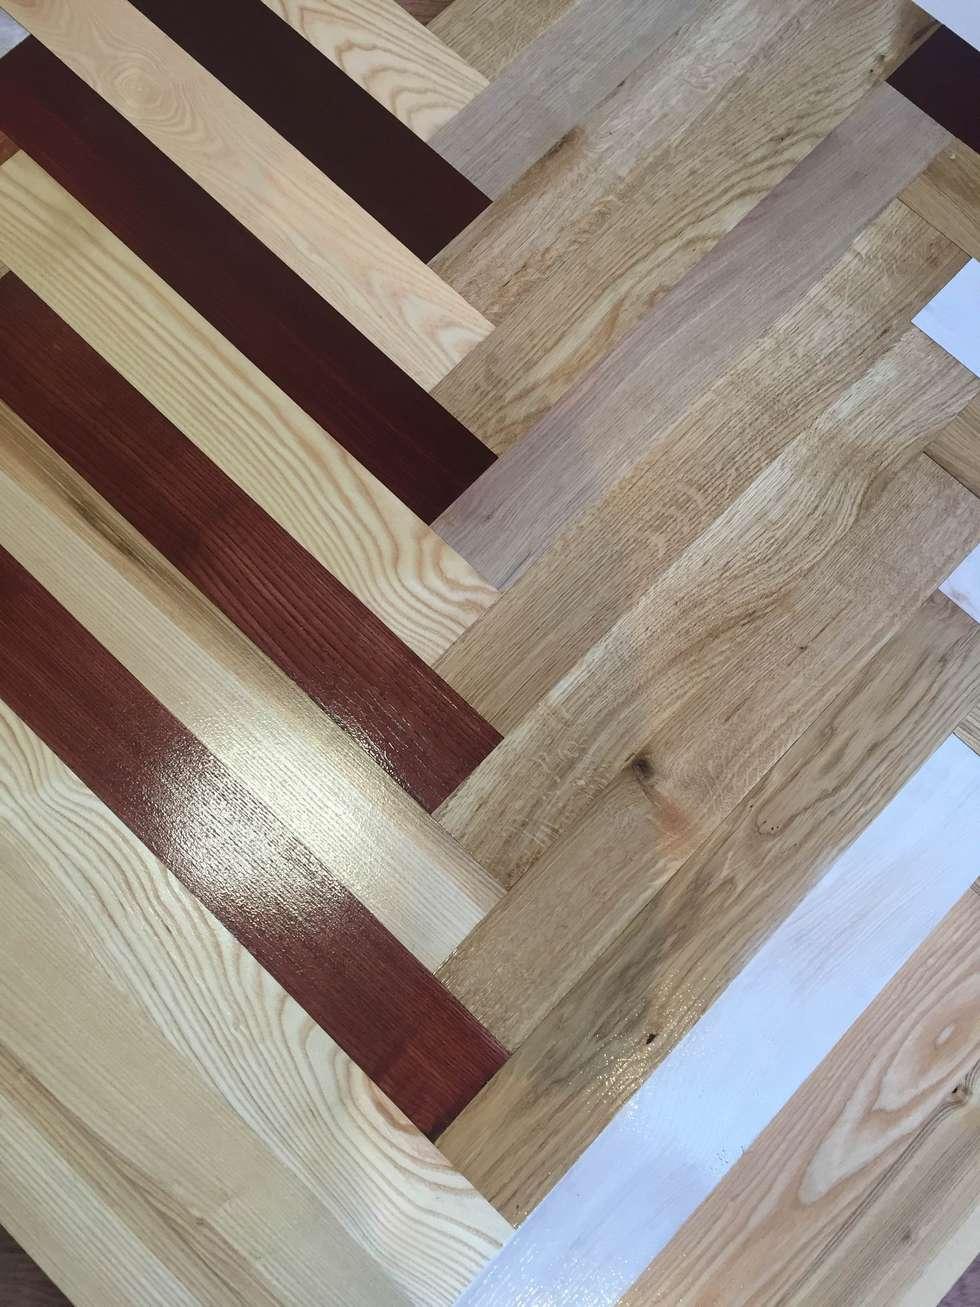 Interior design ideas architecture and renovating photos for Hardwood floors glasgow